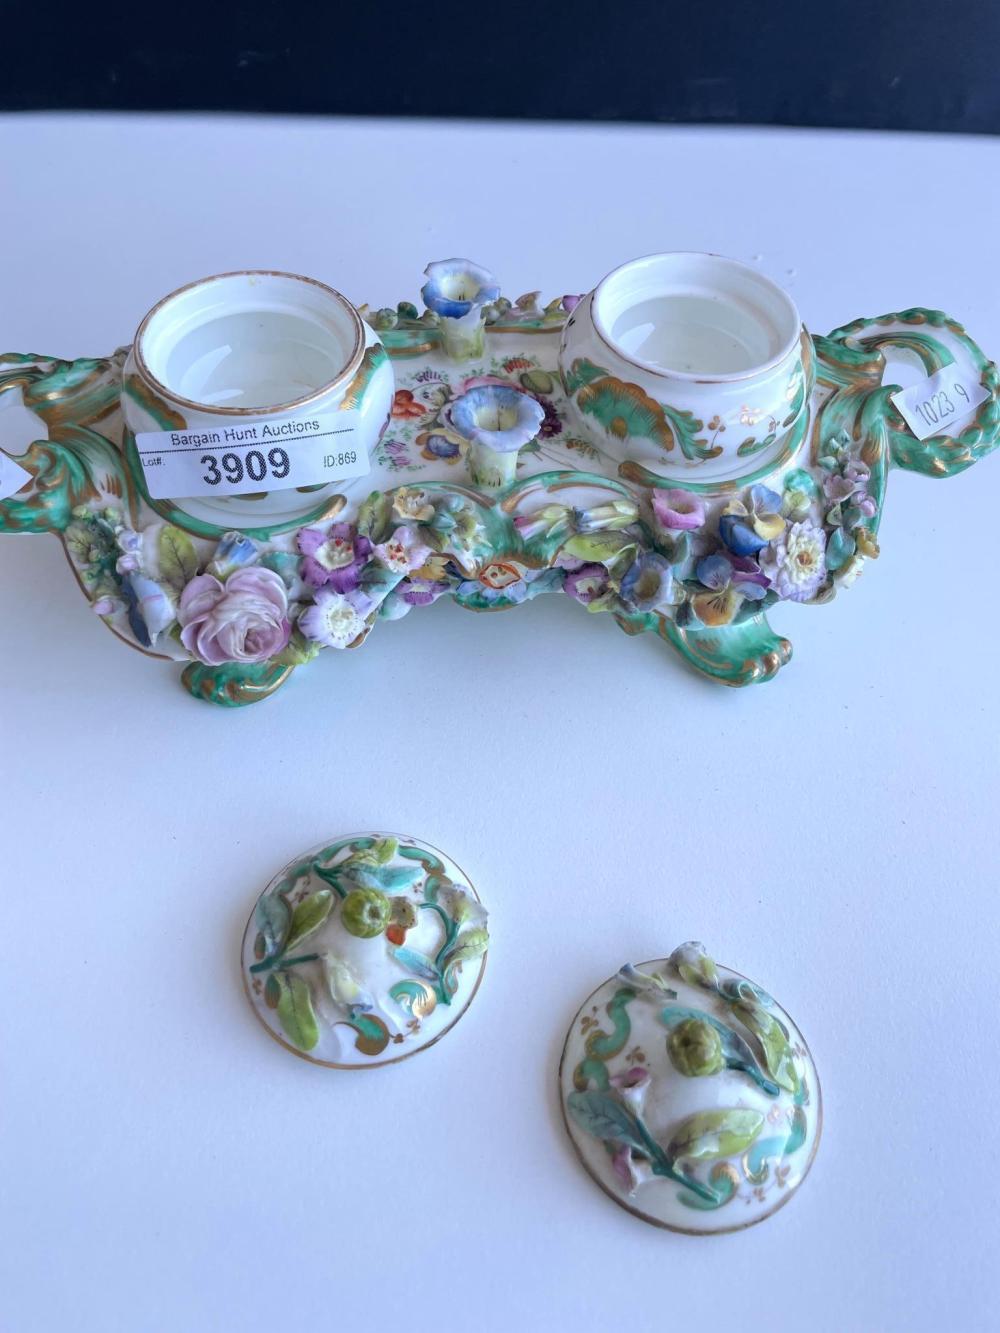 19th Century European porcelain desk stand, 10 x 22 cm. (3.94 x 8.66 in.)